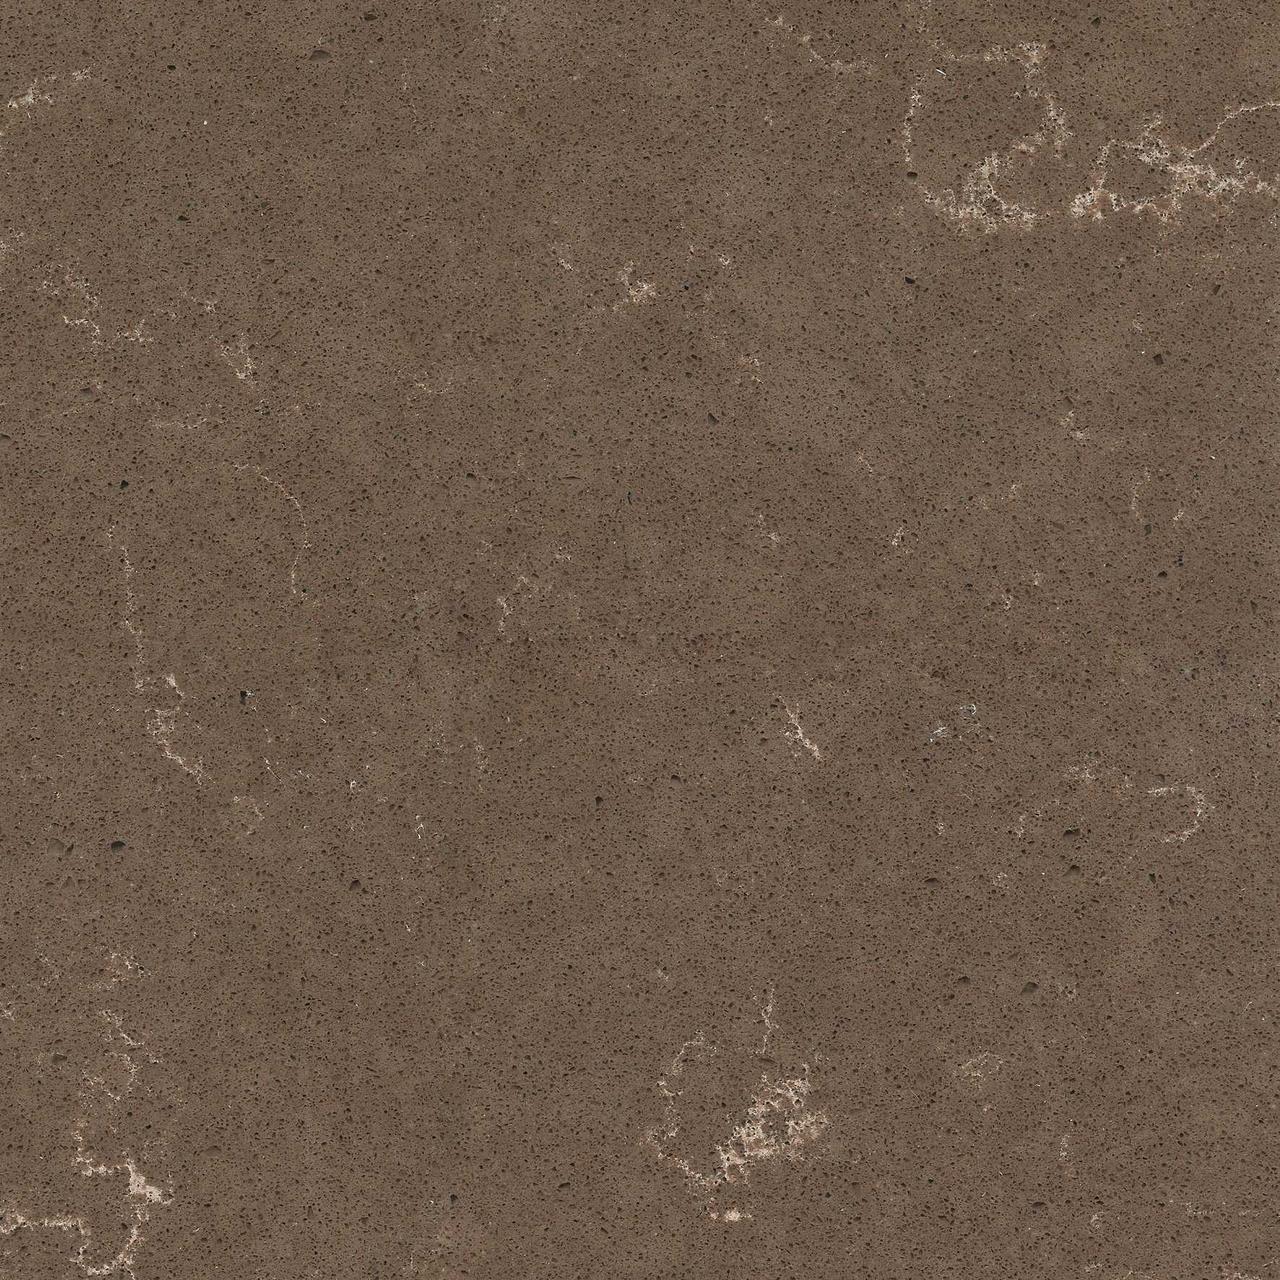 Искусственный камень, Кварц Silestone Iron Bark 20 мм